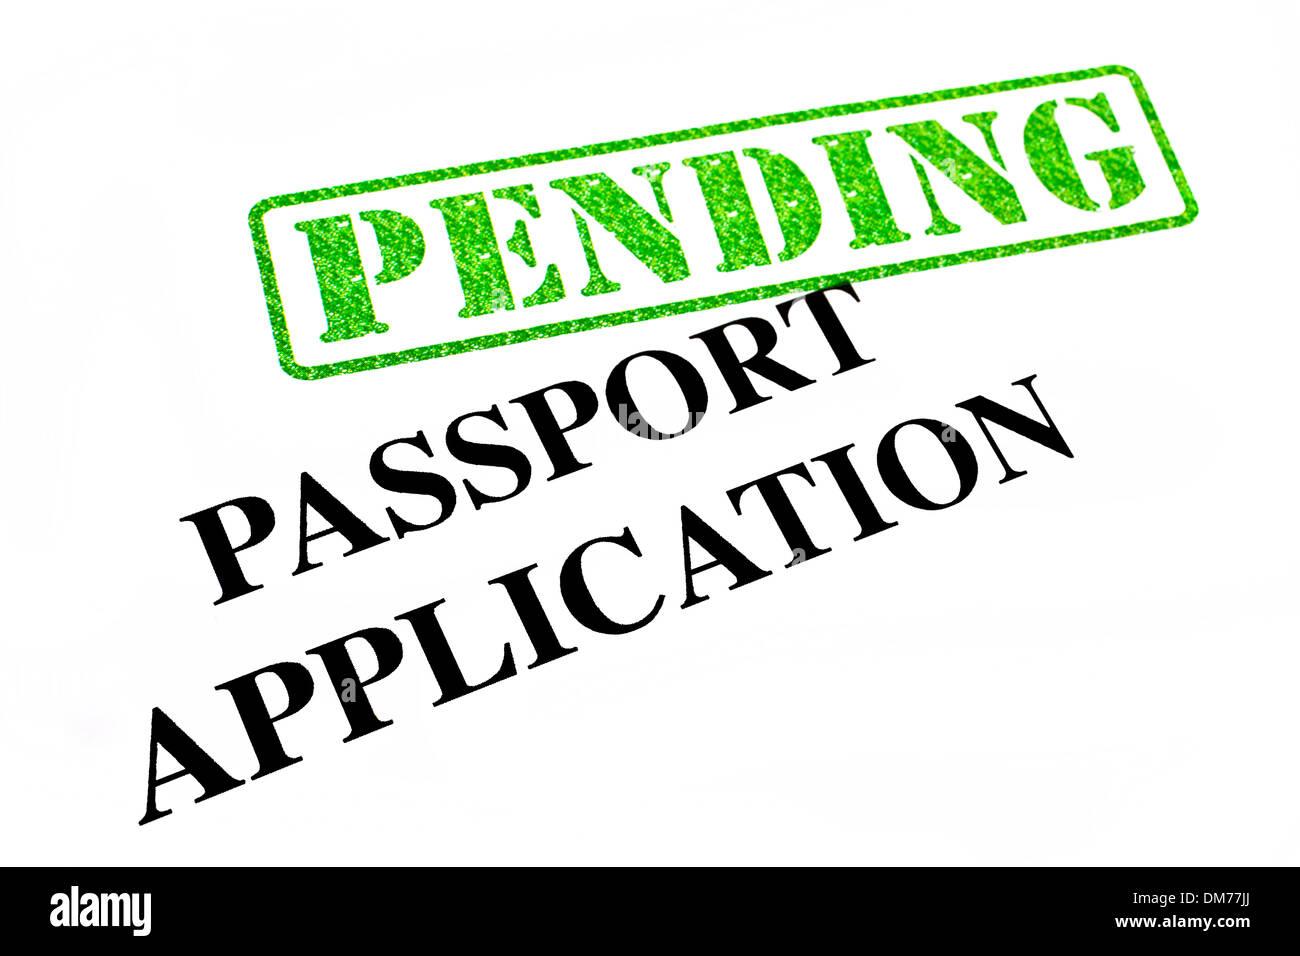 Passport Application is PENDING. Stock Photo